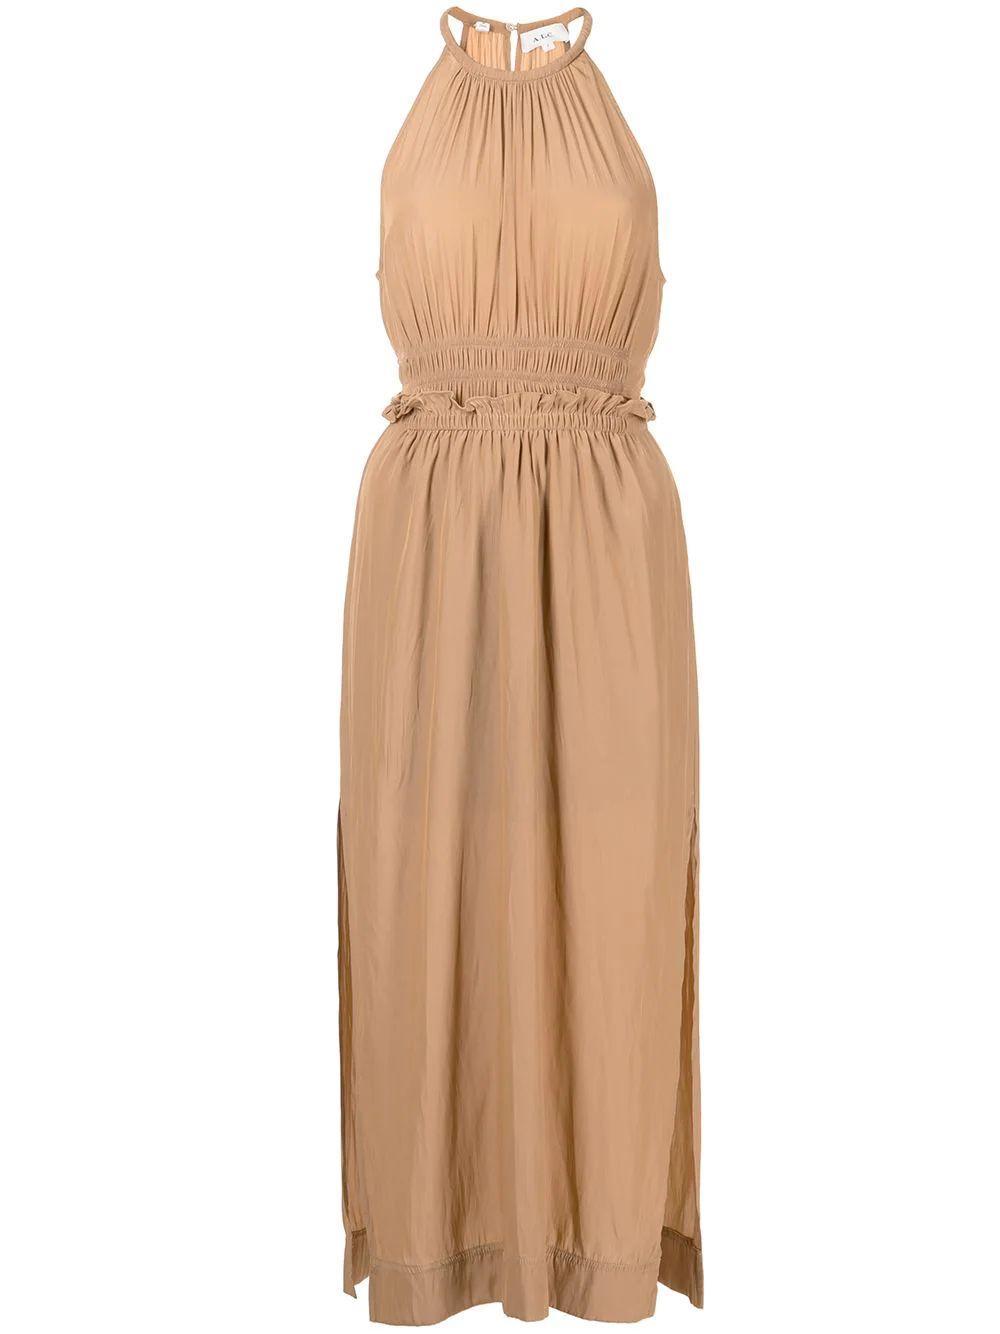 Klara Midi Dress Item # 6DRES01218